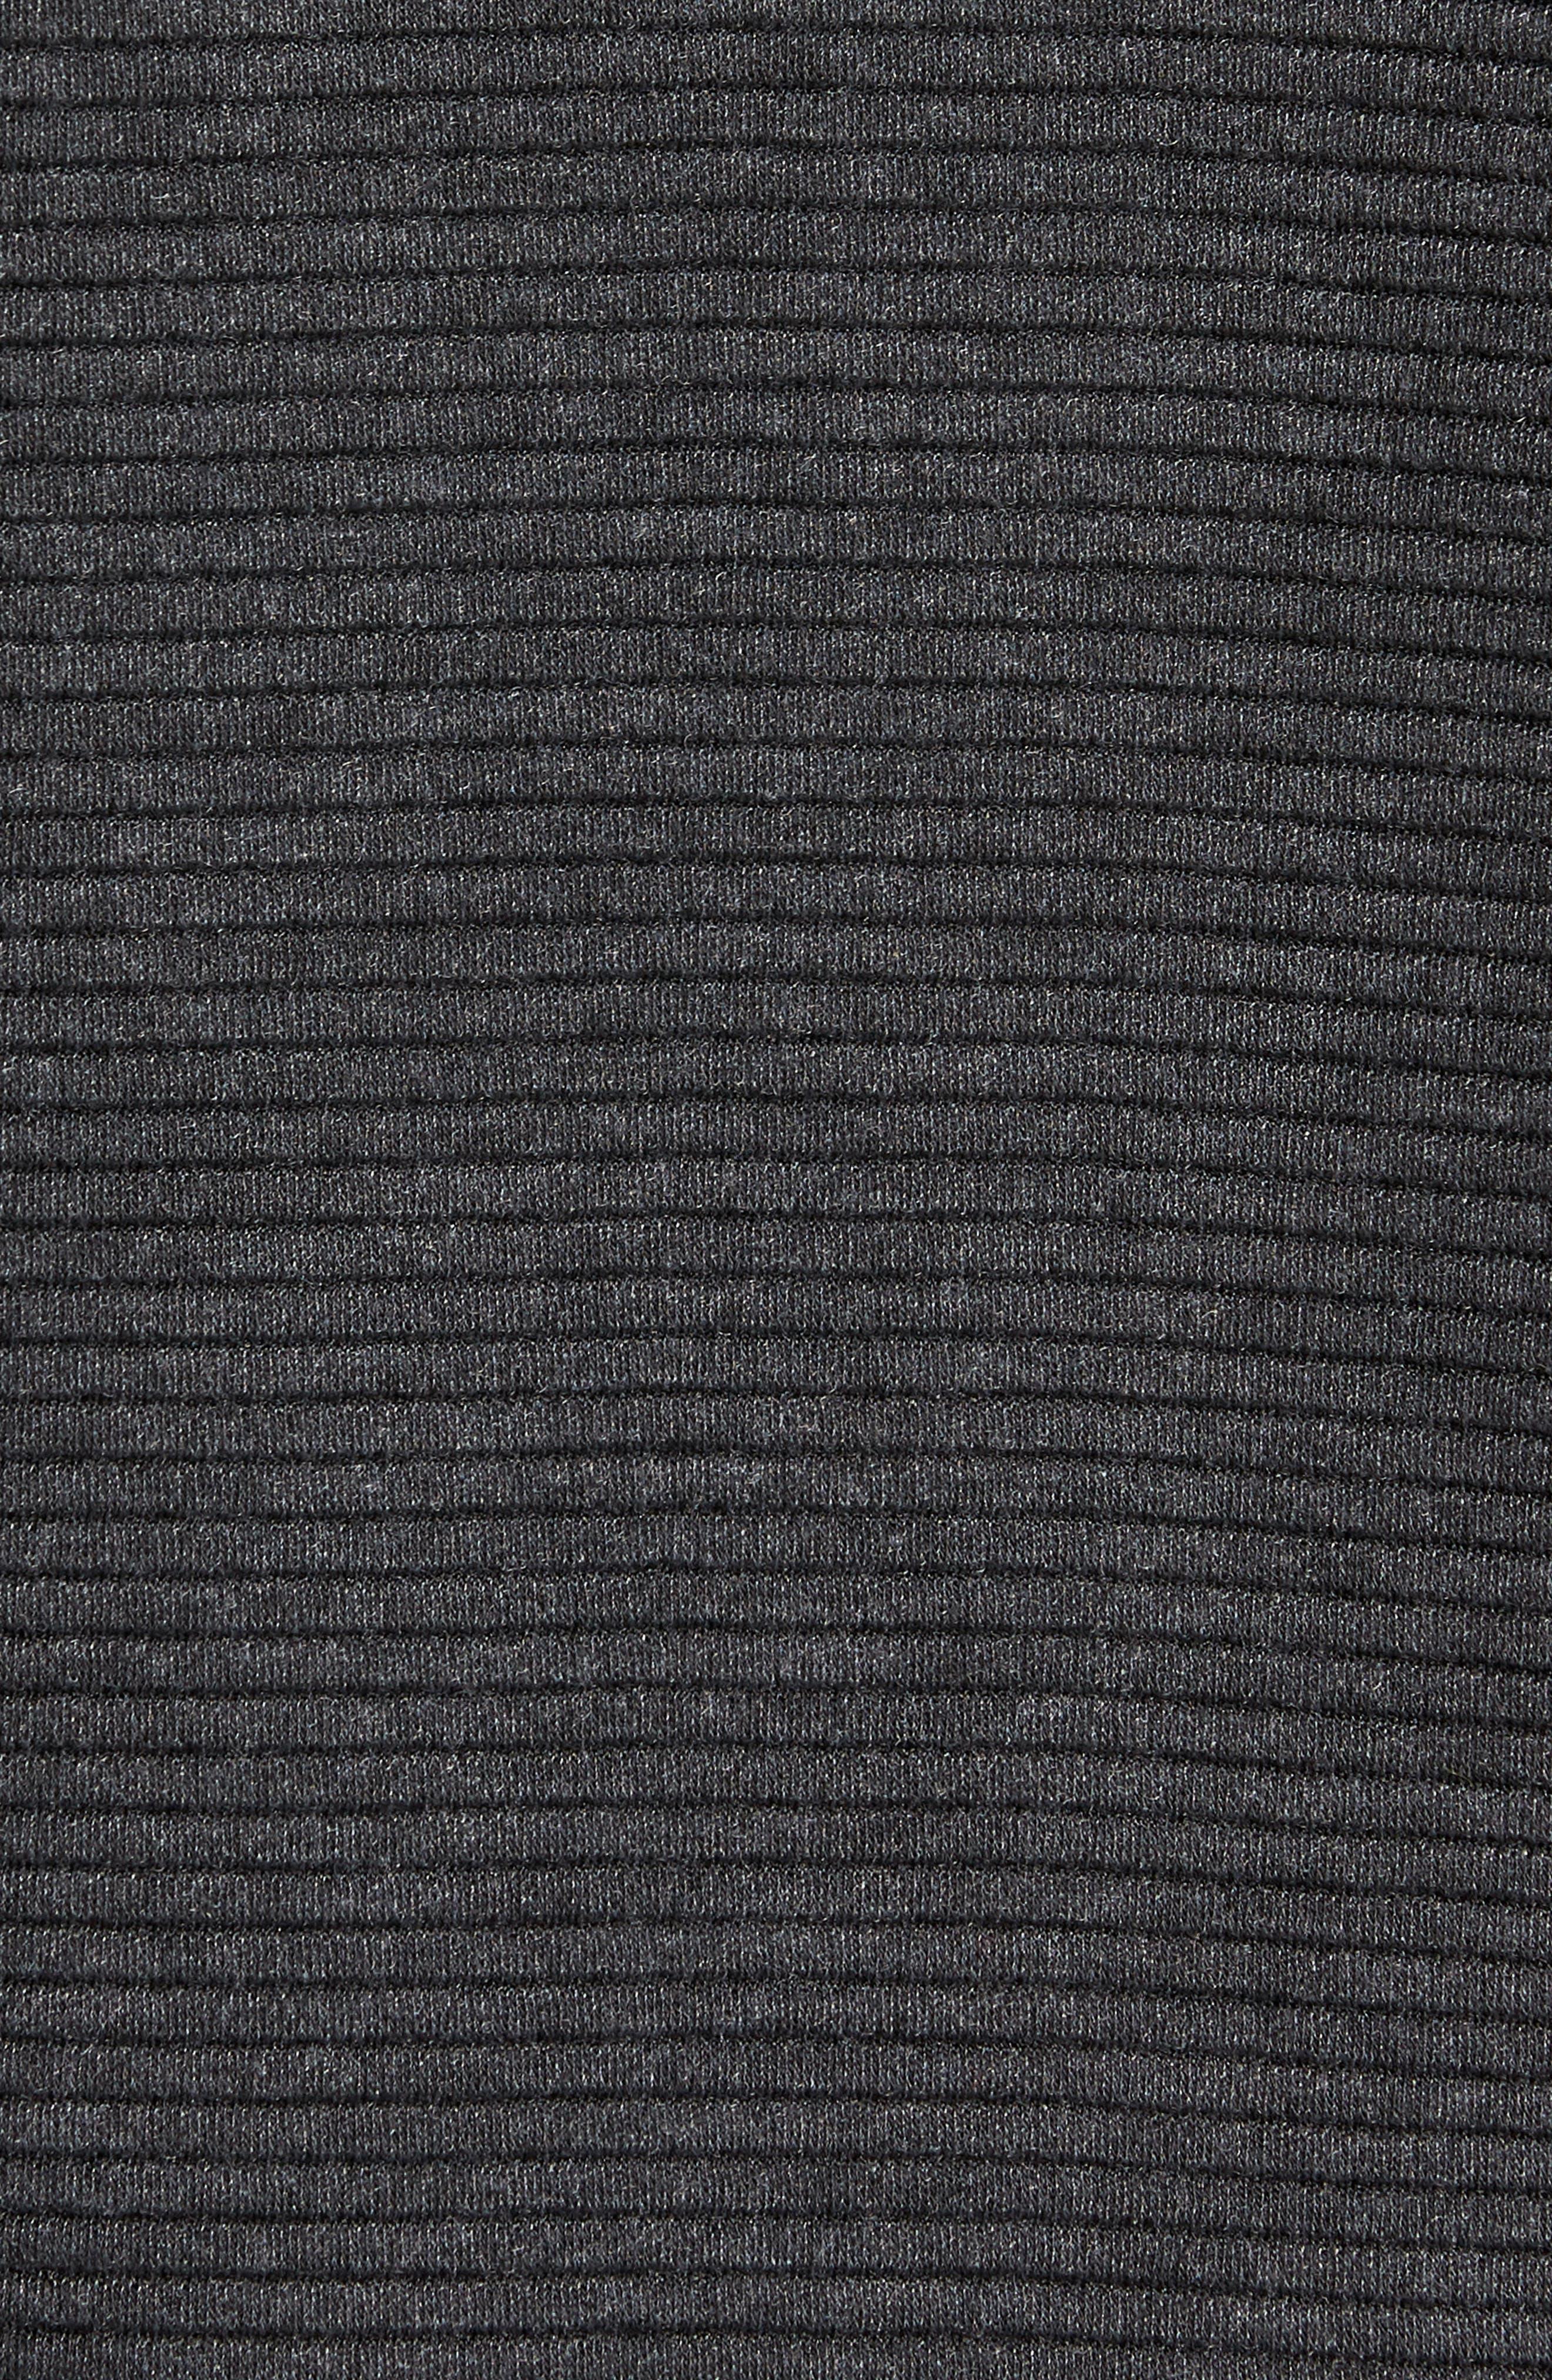 Taenite FZ High Neck Jacket,                             Alternate thumbnail 6, color,                             BLACK OTTOMAN STRIPE